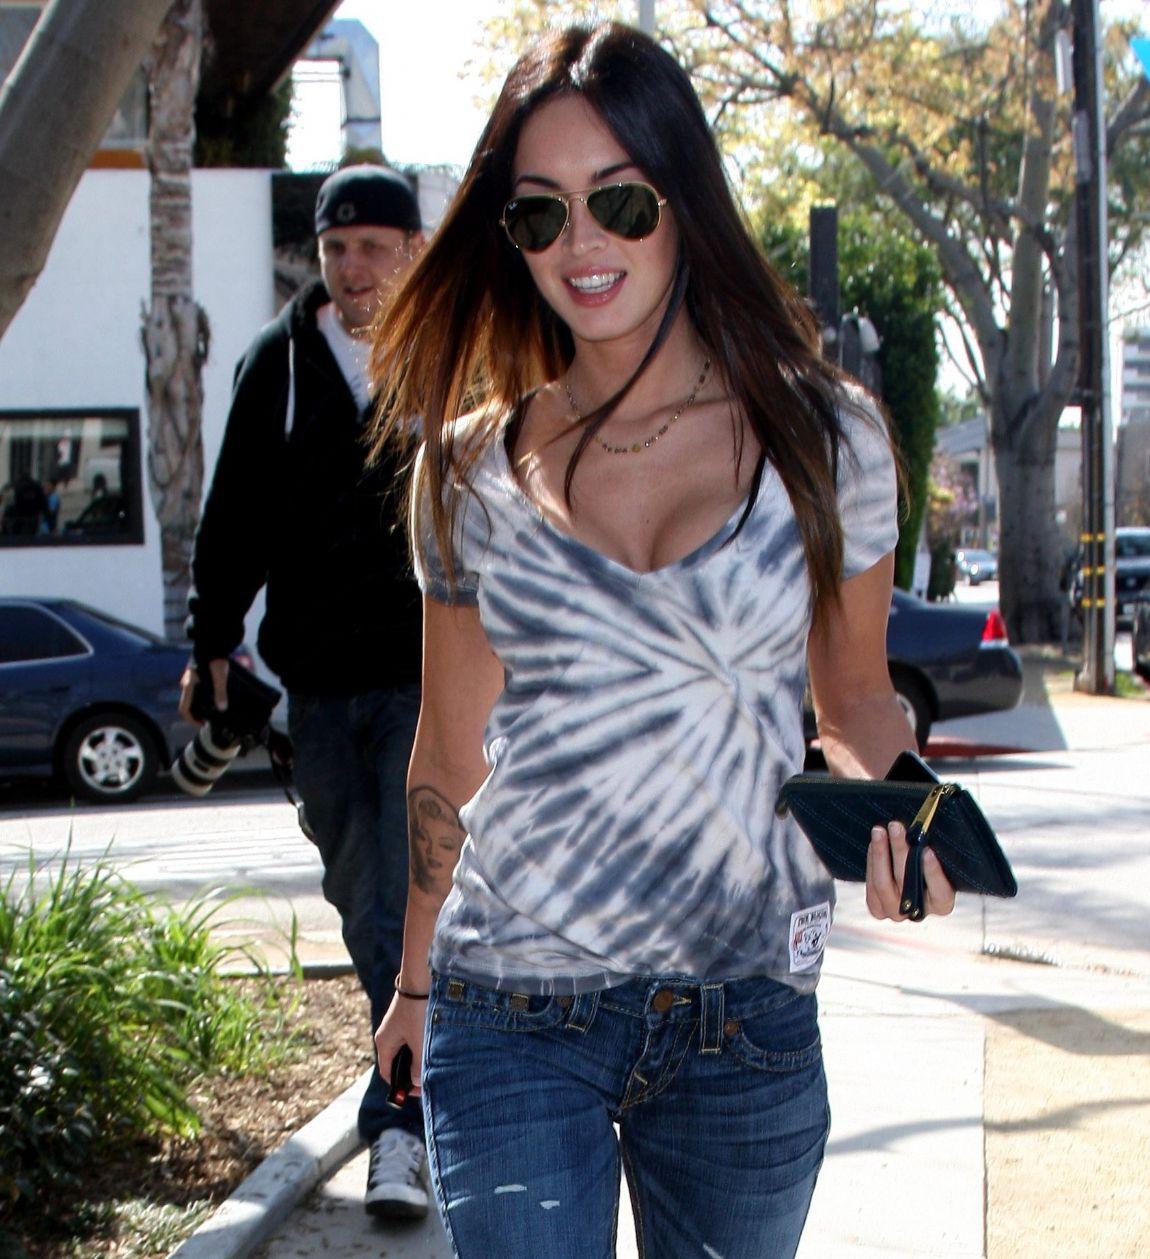 Megan Fox looks Appealing in Shredded Denim Skinny Jeans ...